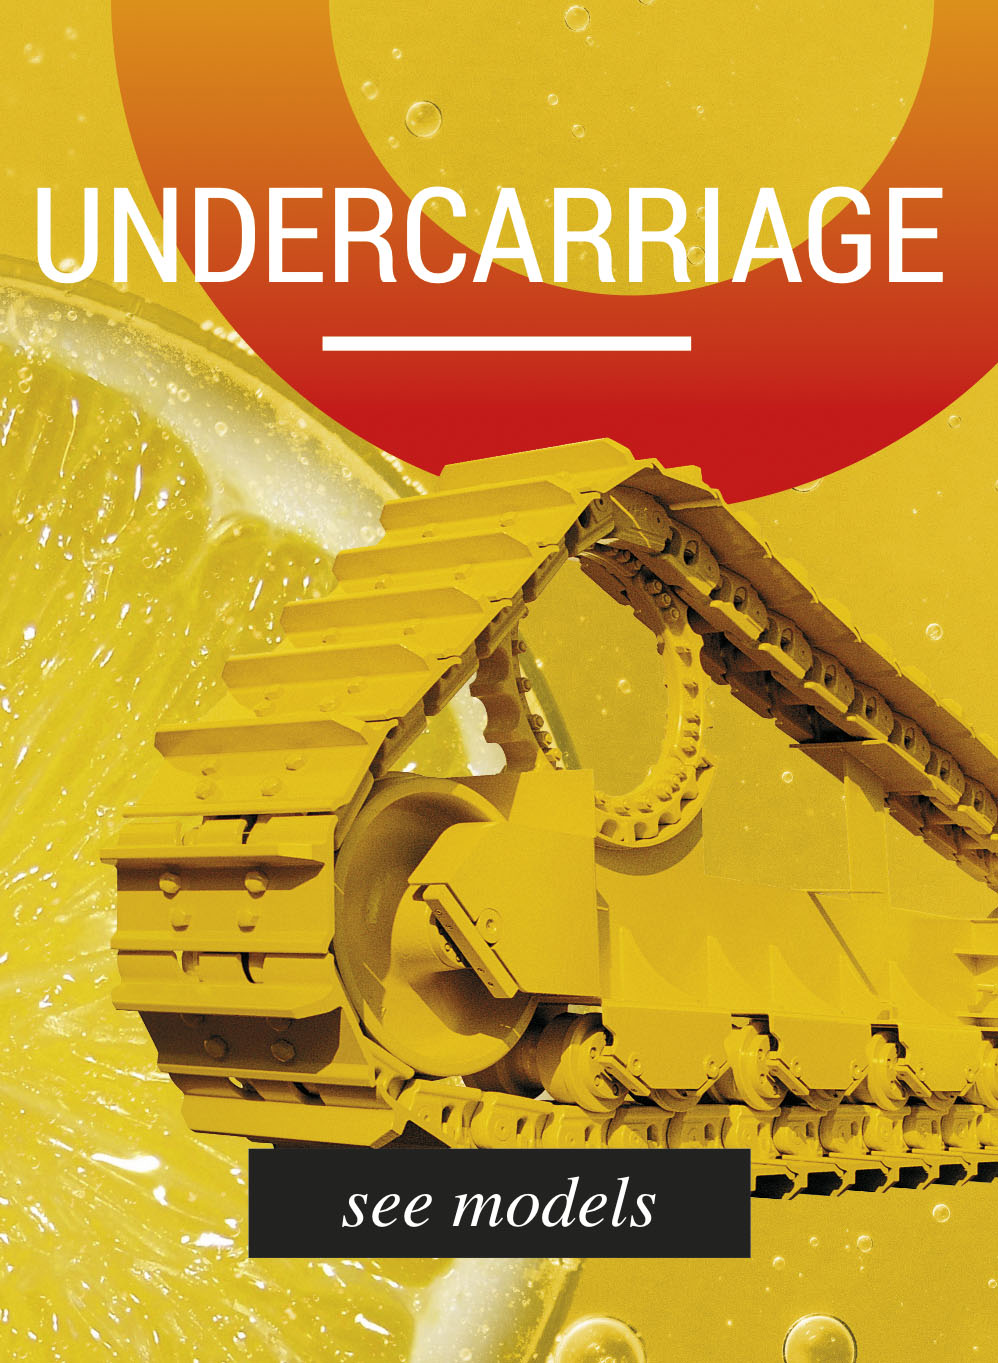 undercarriage